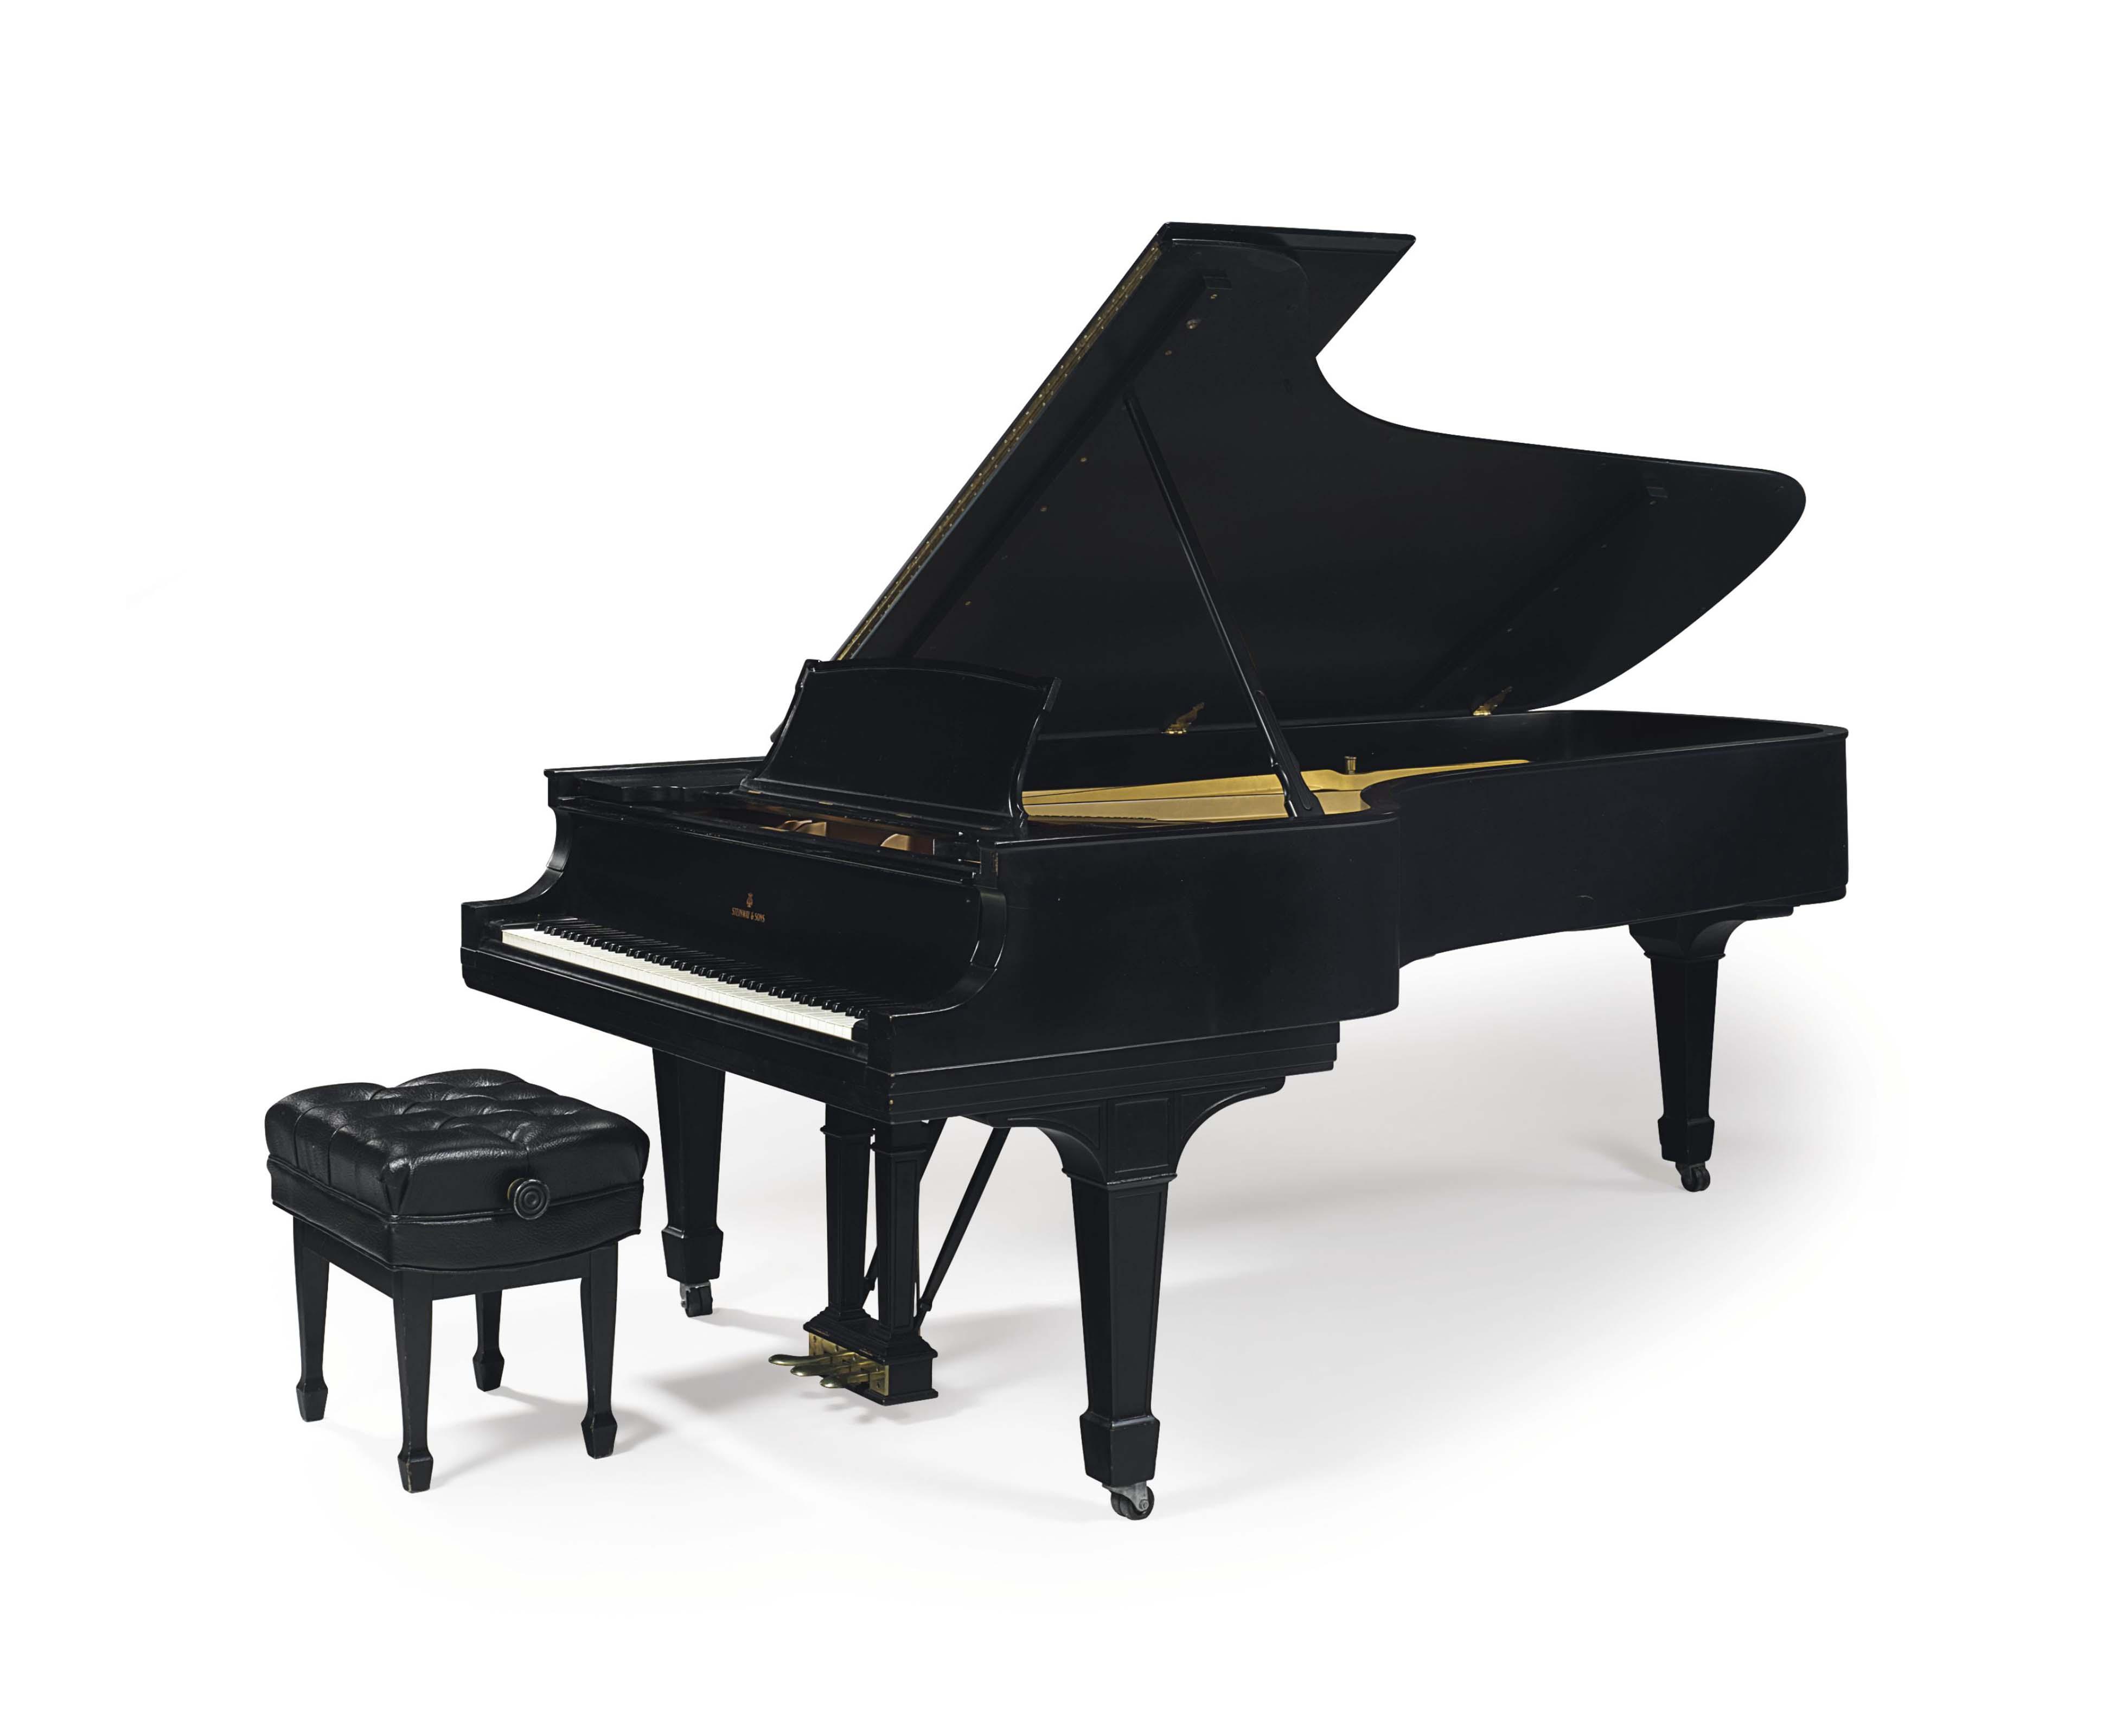 A STEINWAY MODEL D EBONIZED CONCERT GRAND PIANO